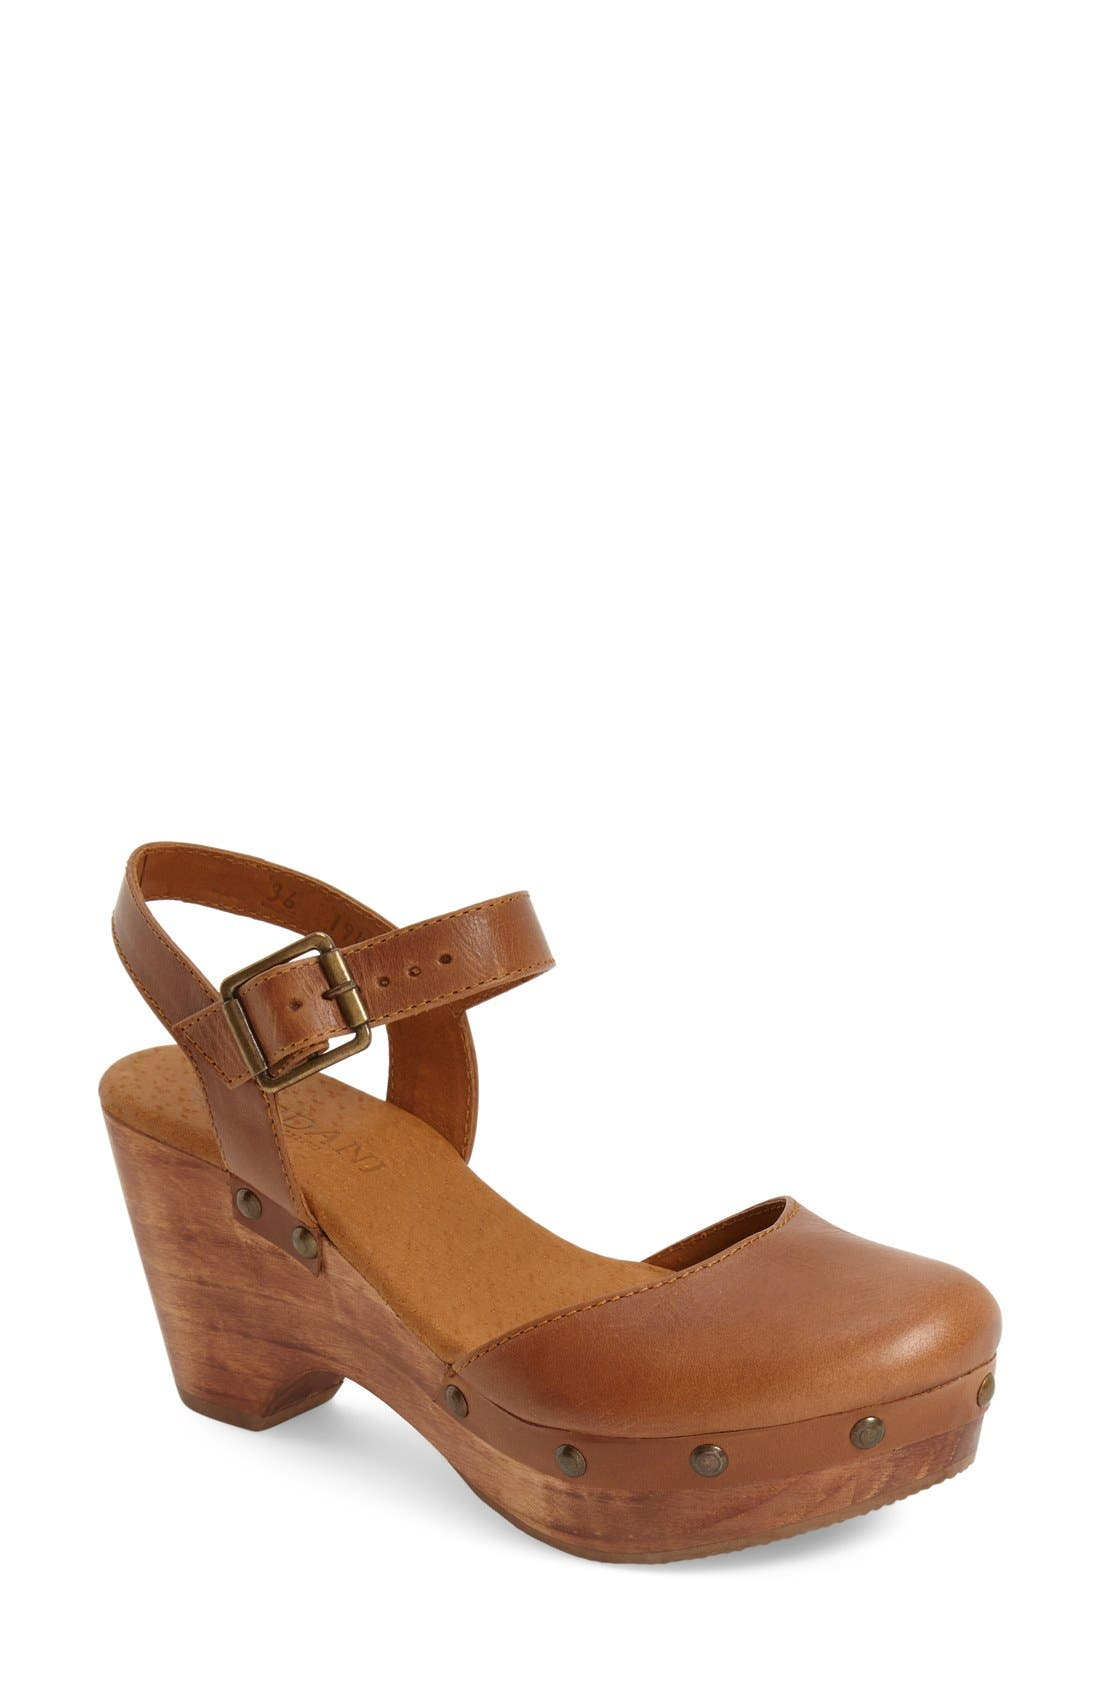 Main Image - Cordani 'Zori' Sandal (Women)